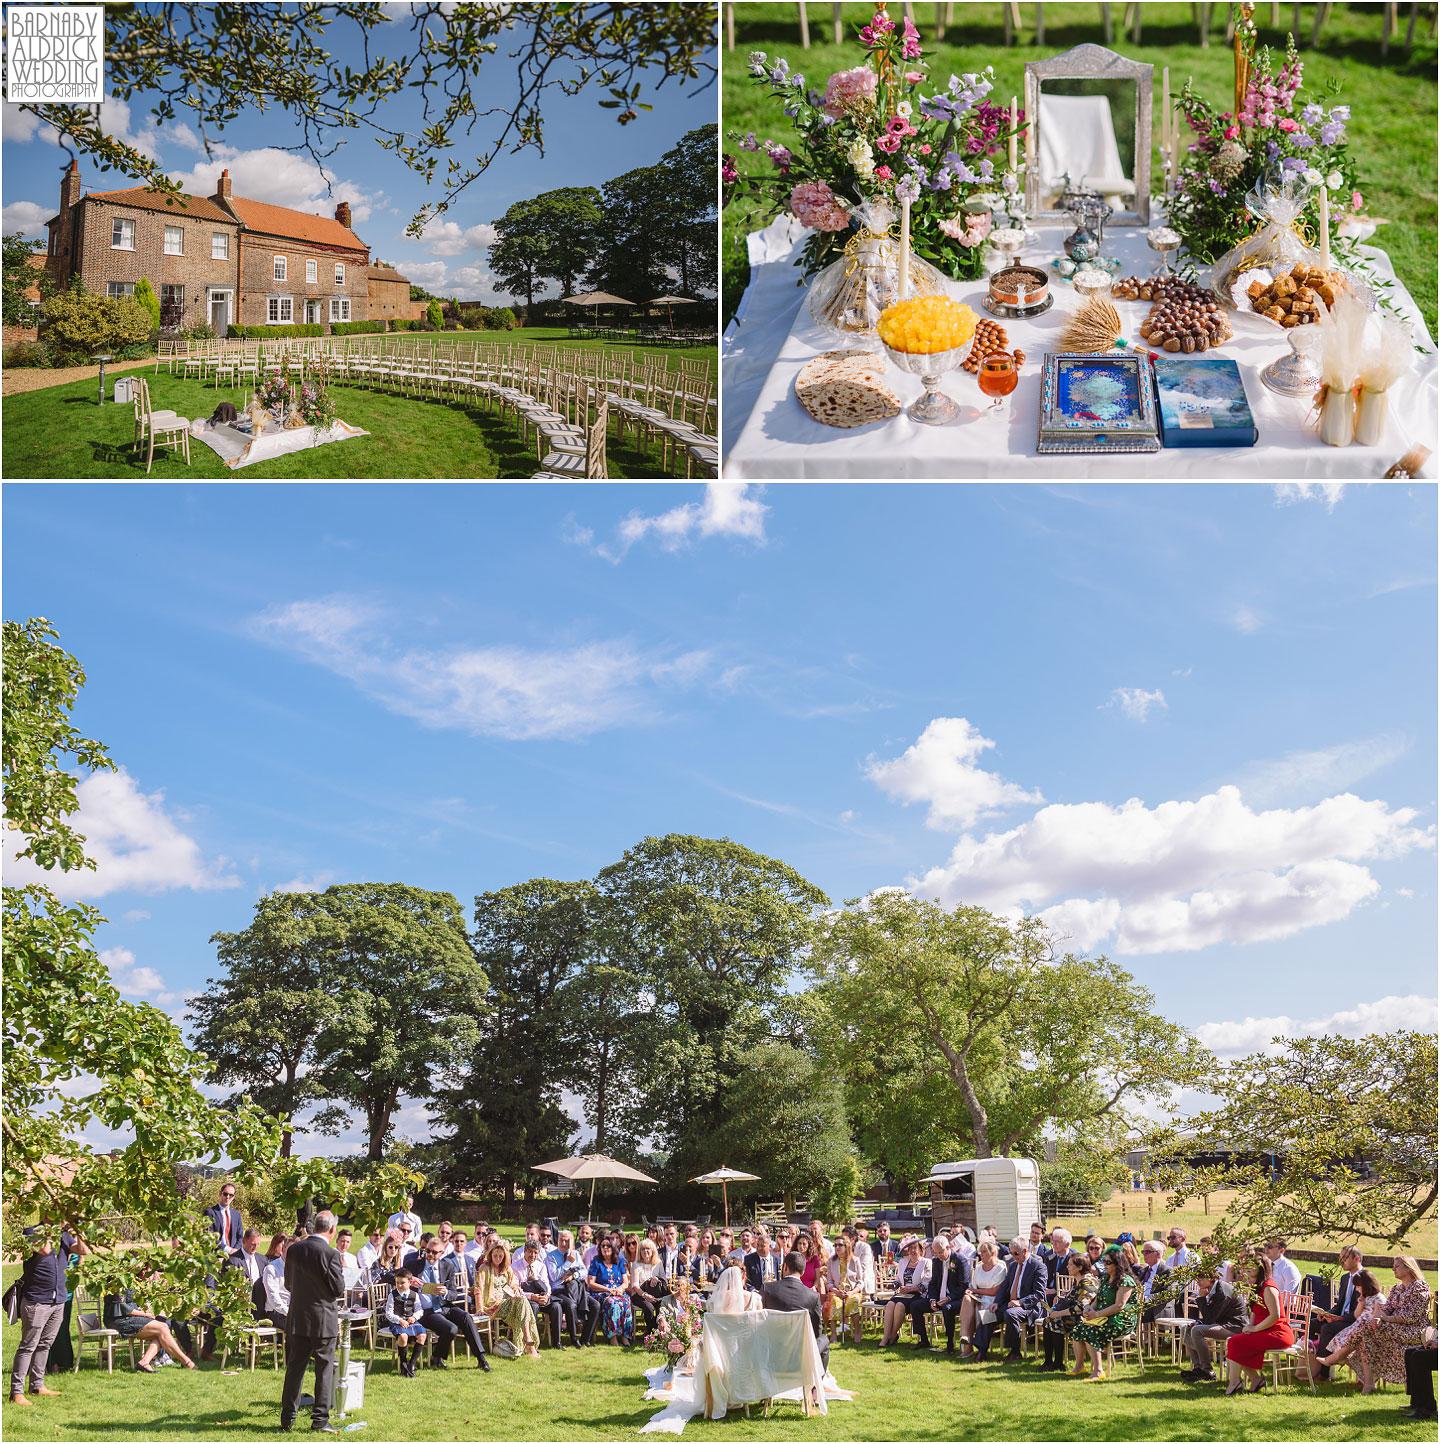 Iranian outdoor wedding ceremony at Hornington Manor luxury barn wedding venue near York in North Yorkshire